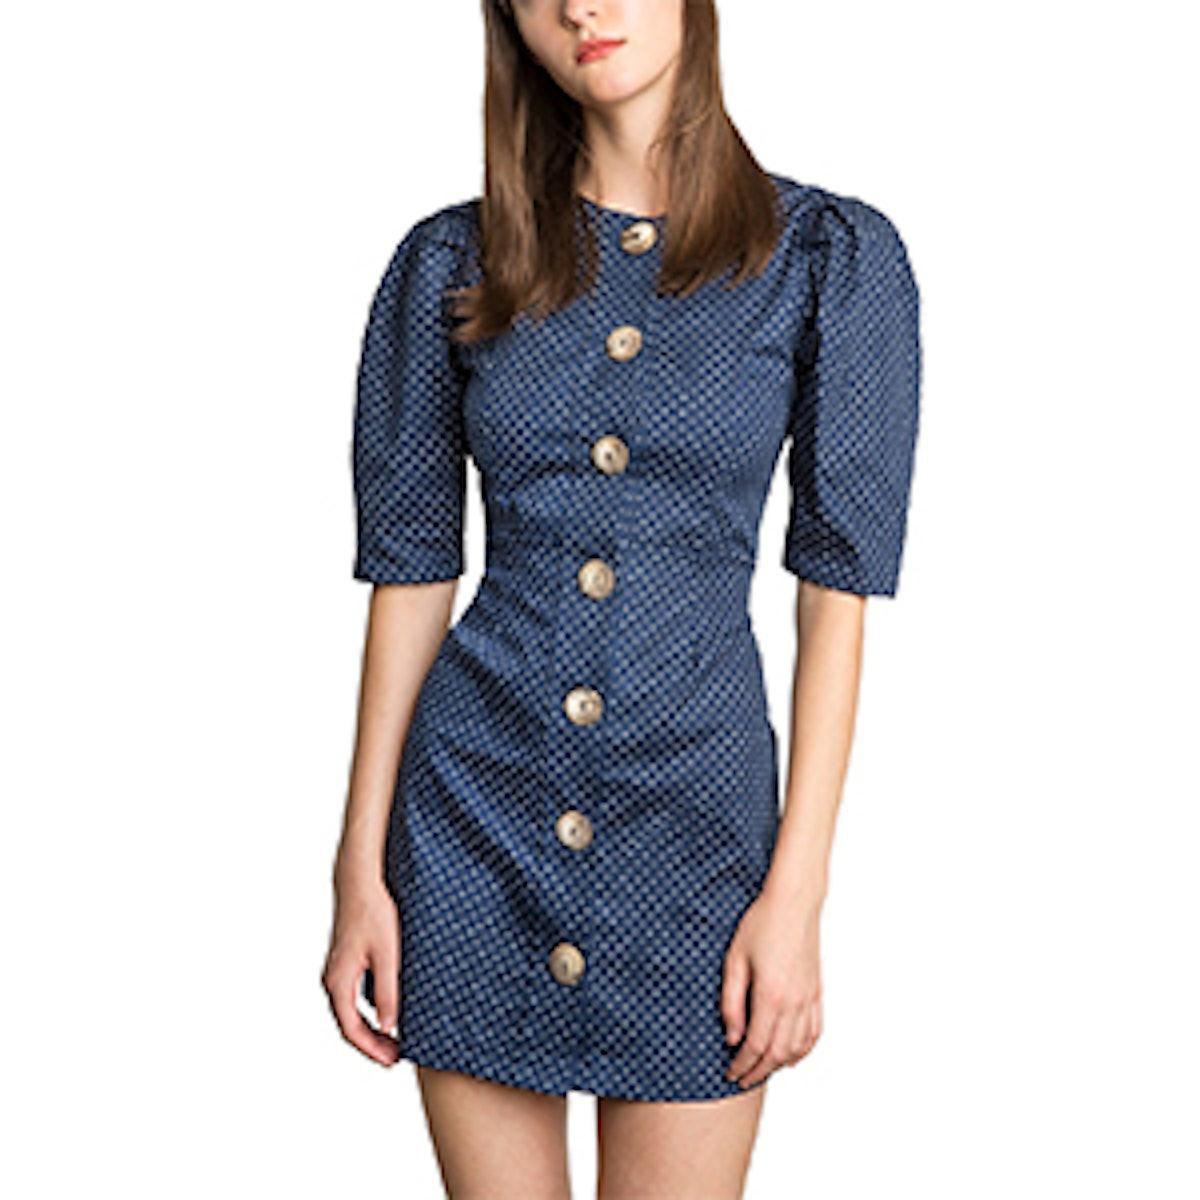 Mirabel Polka Dot Button Dress